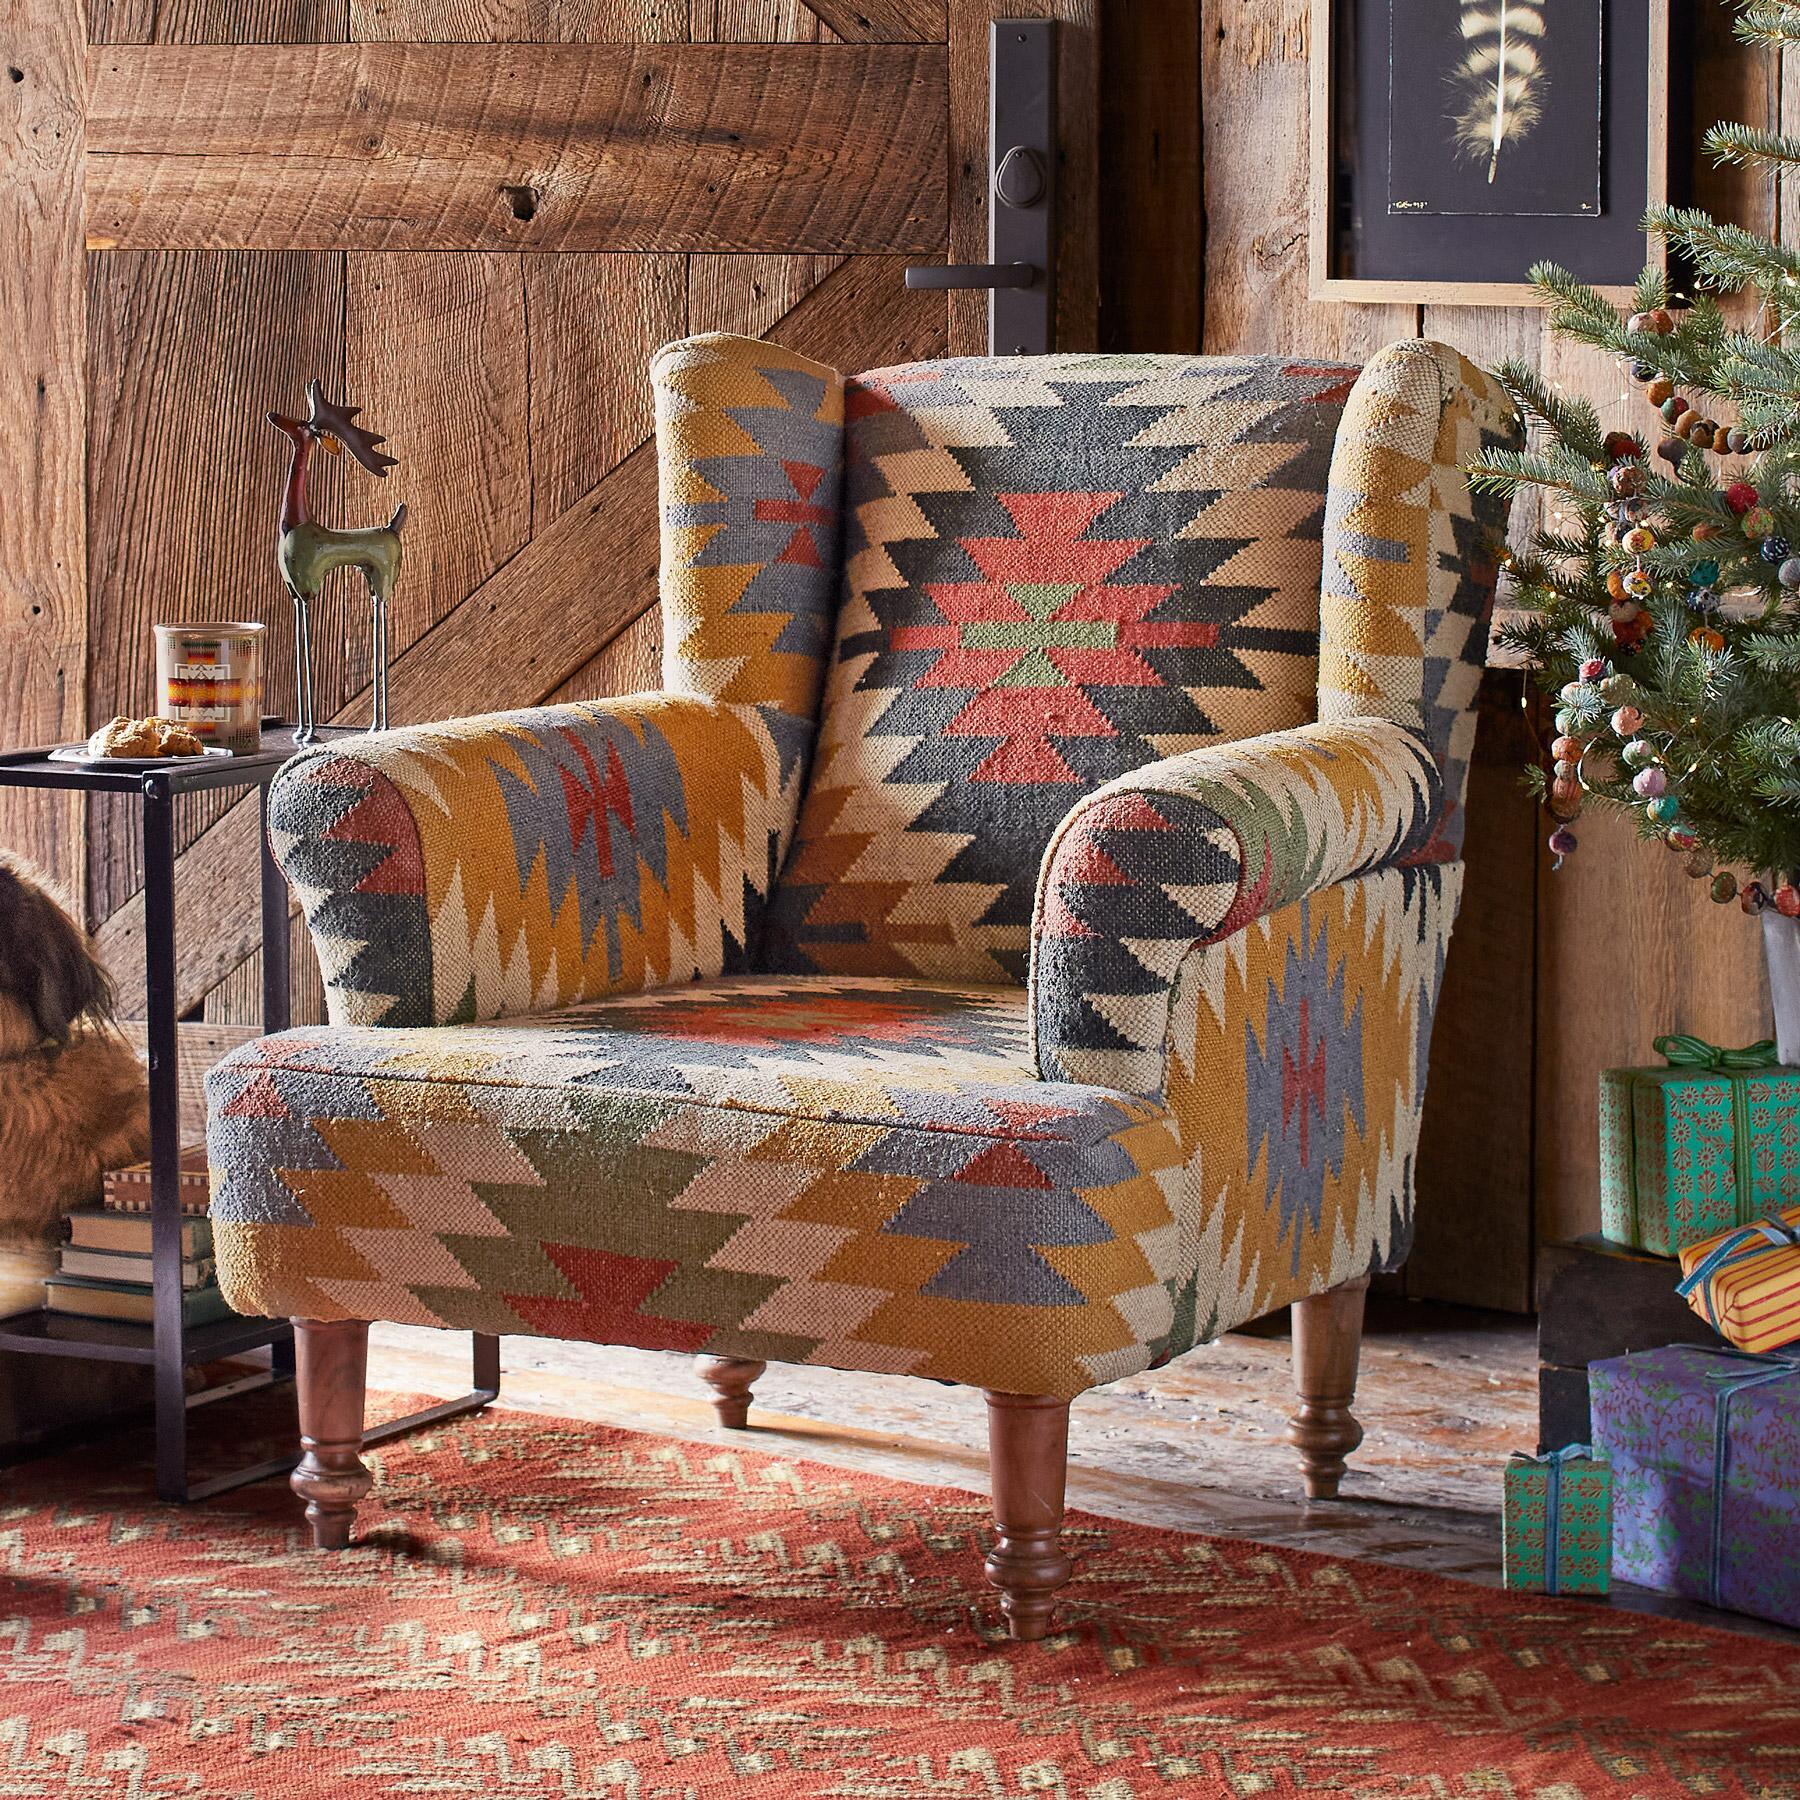 Wondrous Mesa Kilim Club Chair Robert Redfords Sundance Catalog Interior Design Ideas Gentotryabchikinfo